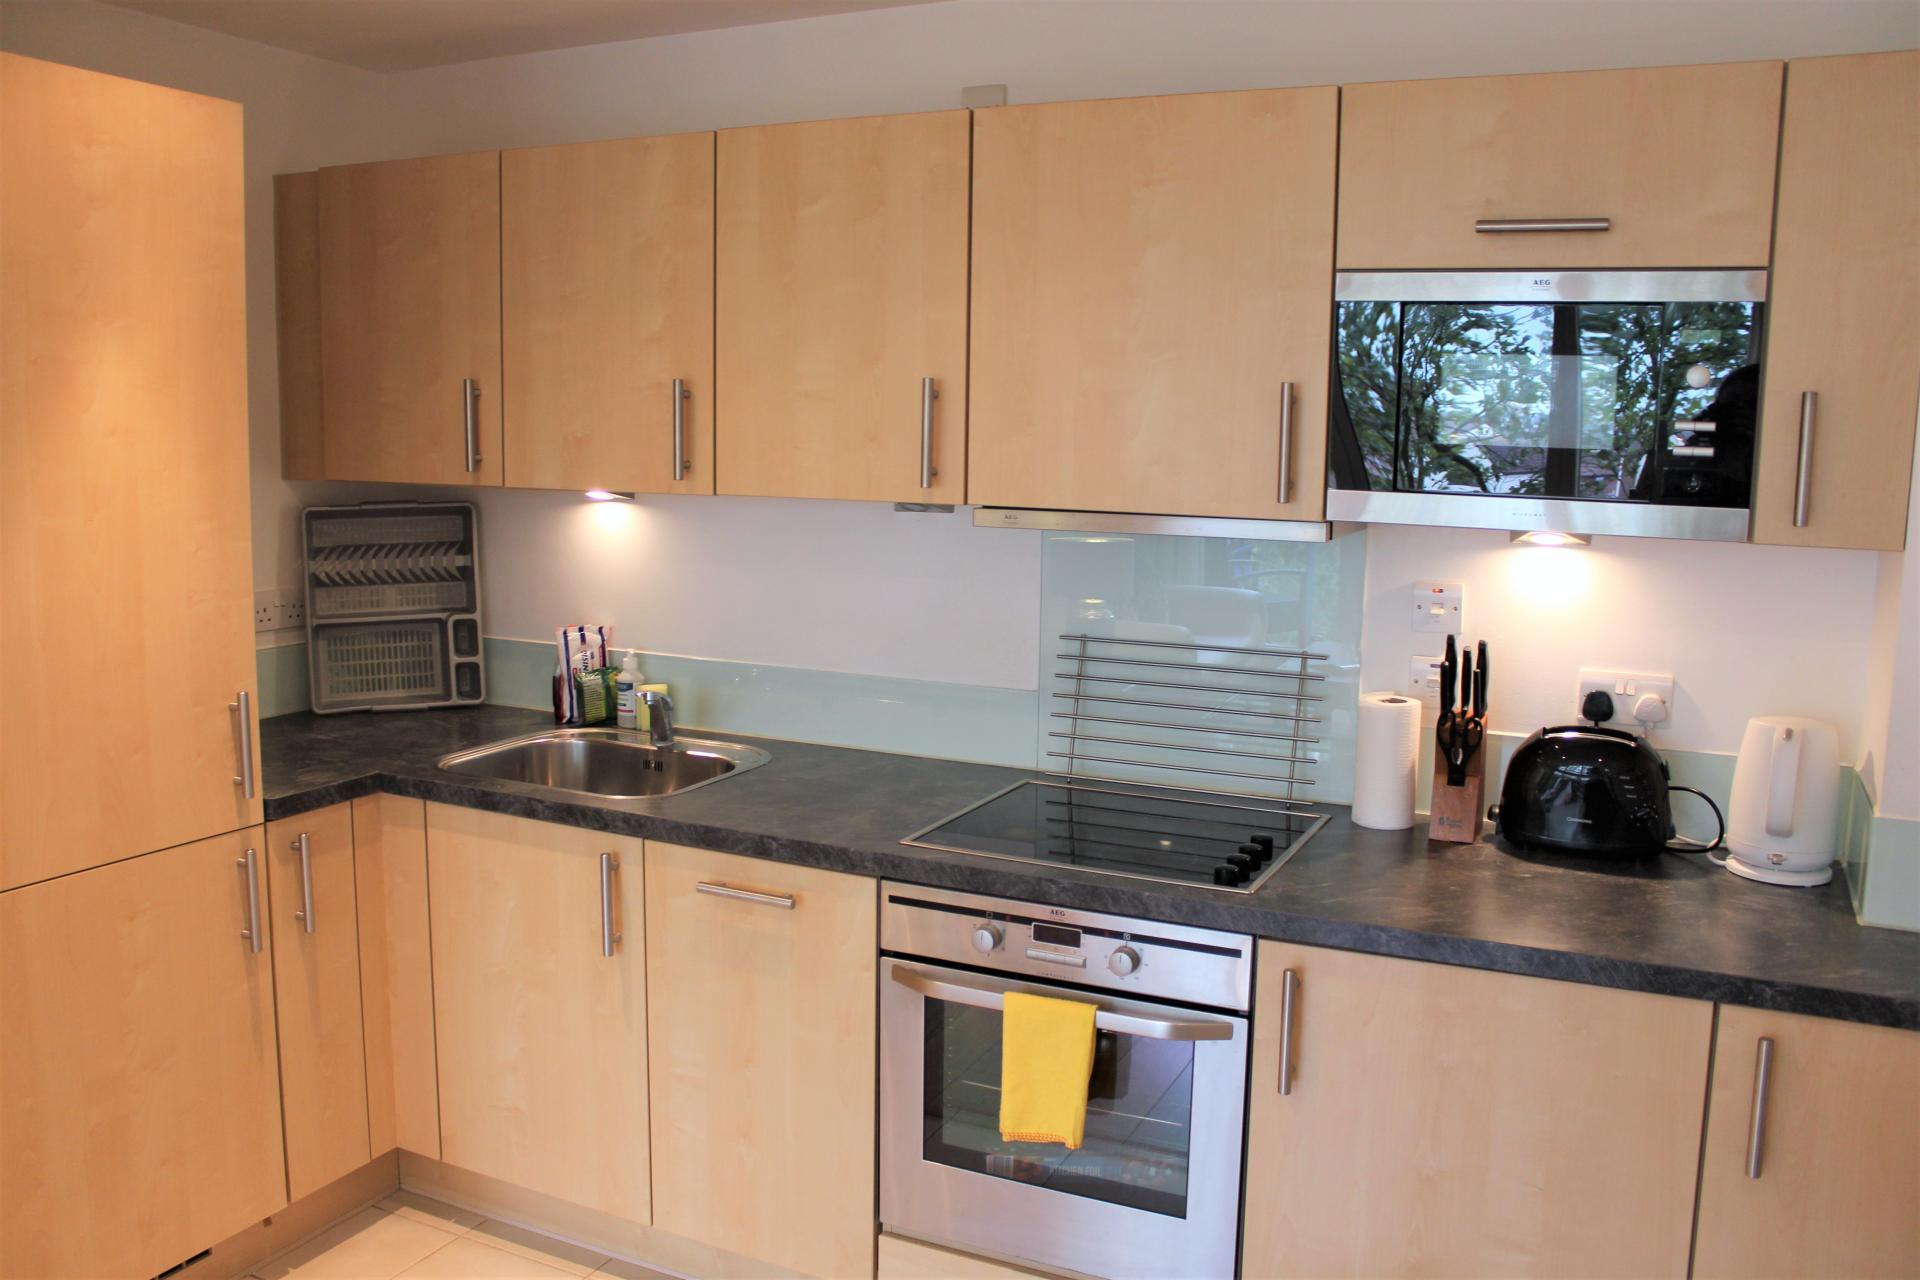 Fully equipped kitchen at Gunwharf Quays Apartments, Gunwharf Quays, Portsmouth